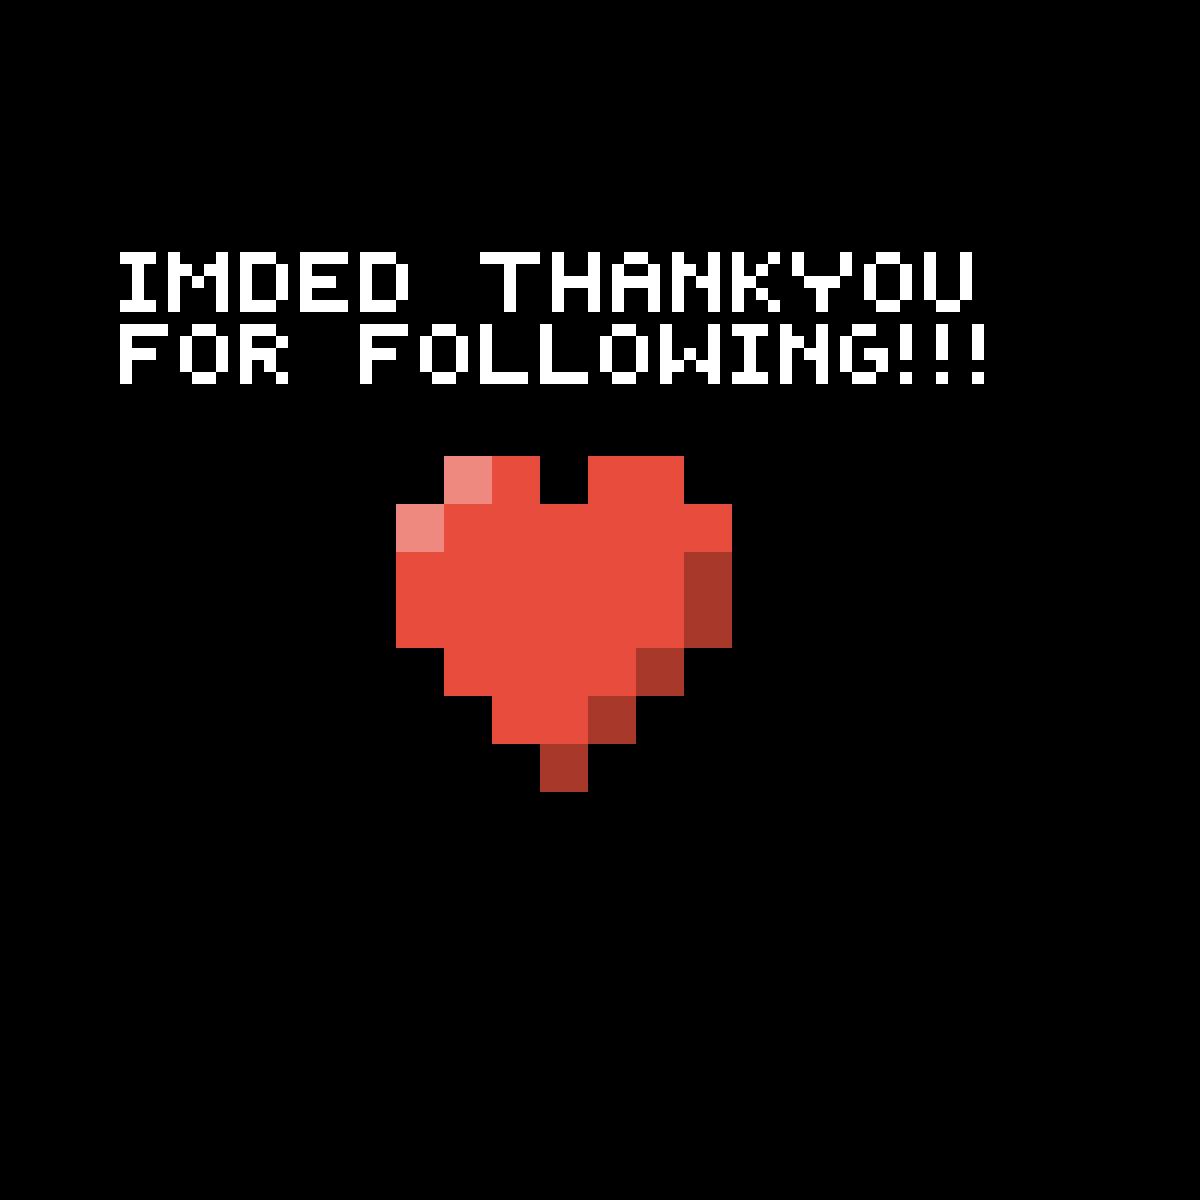 Thank you first follower by MiracleMerch